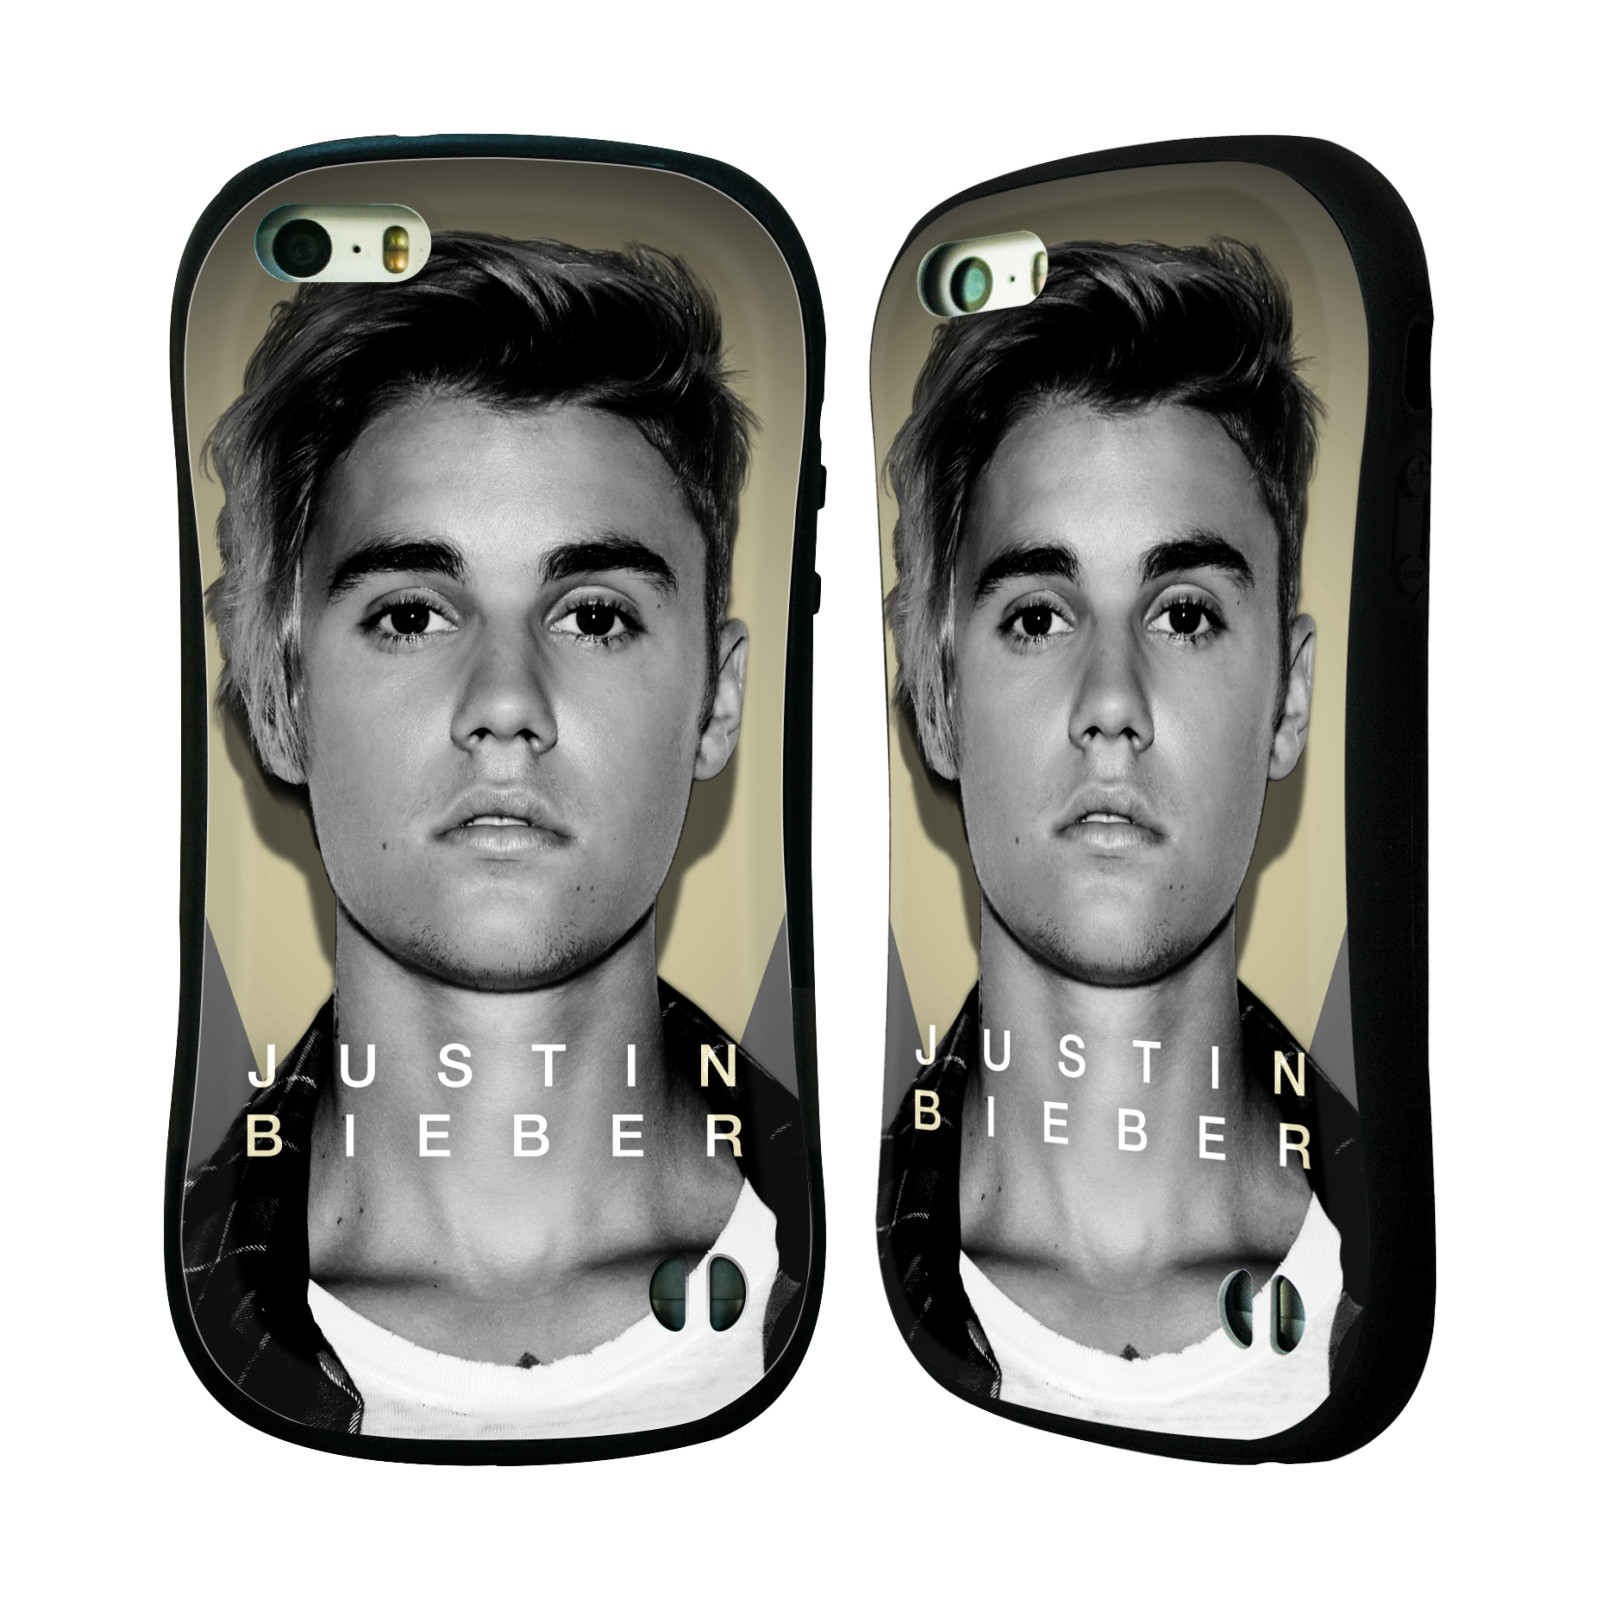 HEAD CASE silikon/plast odolný obal na mobil Apple Iphone 5 / 5S originální potisk Justin Bieber foto portrét